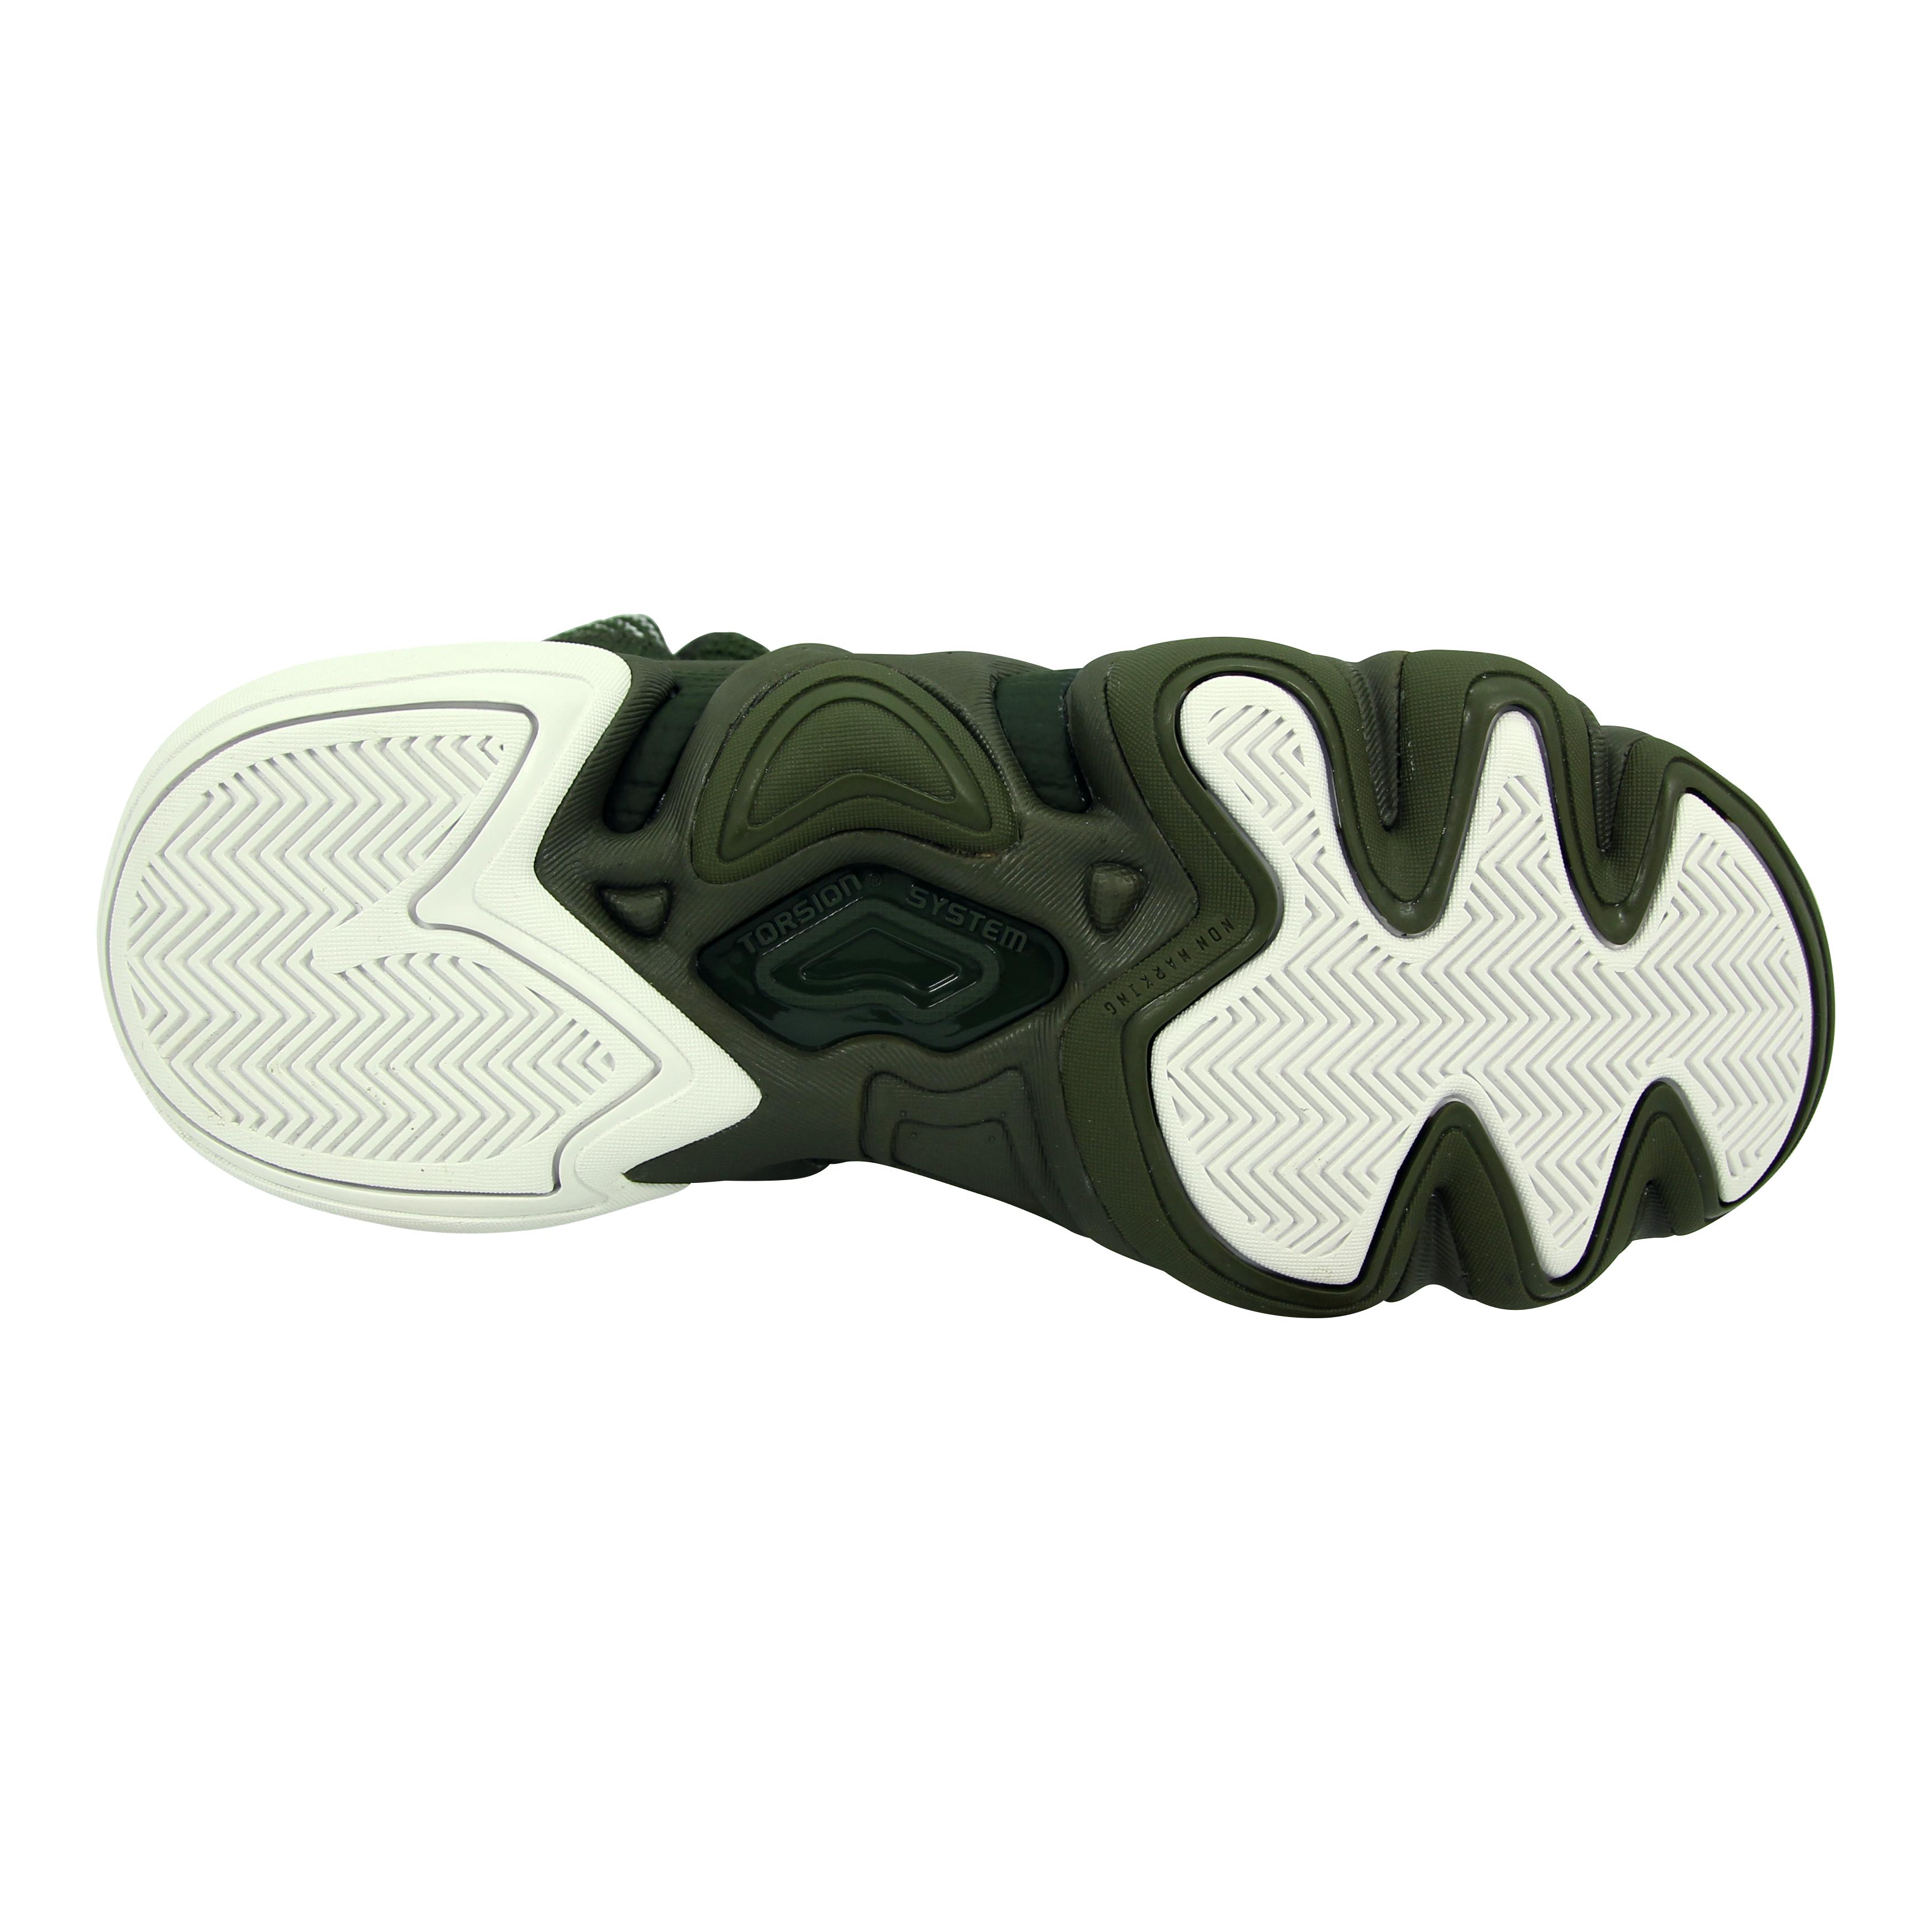 official photos a370c fce0b adidas-Originals-CRAZY-8-ADV-PRIMEKNIT-Men-Sneakers-